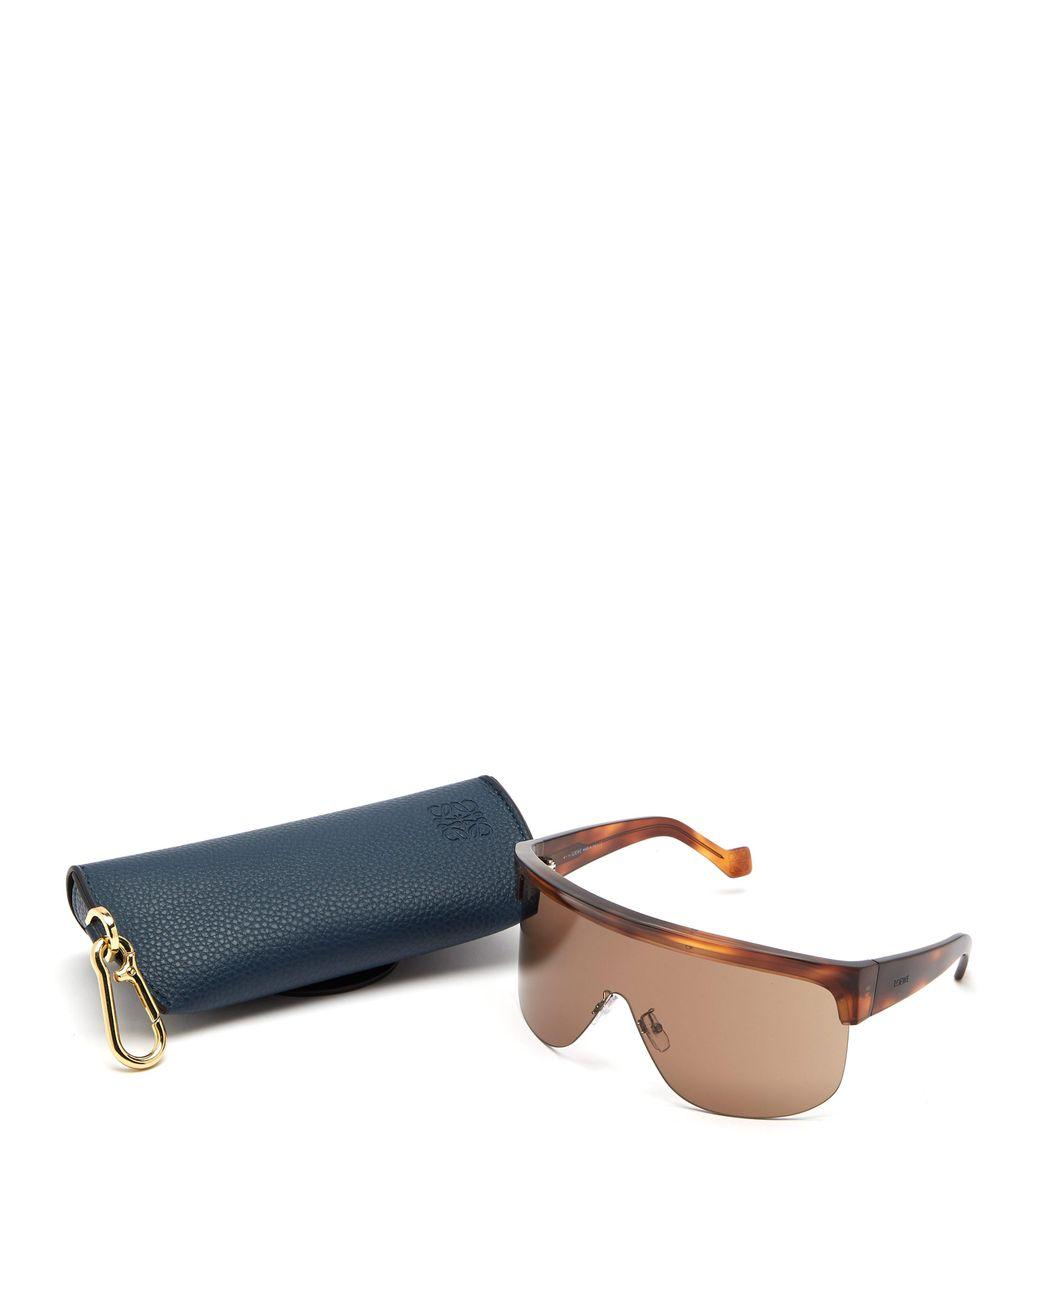 93de80c995 Loewe Show D Frame Visor Sunglasses in Brown - Lyst